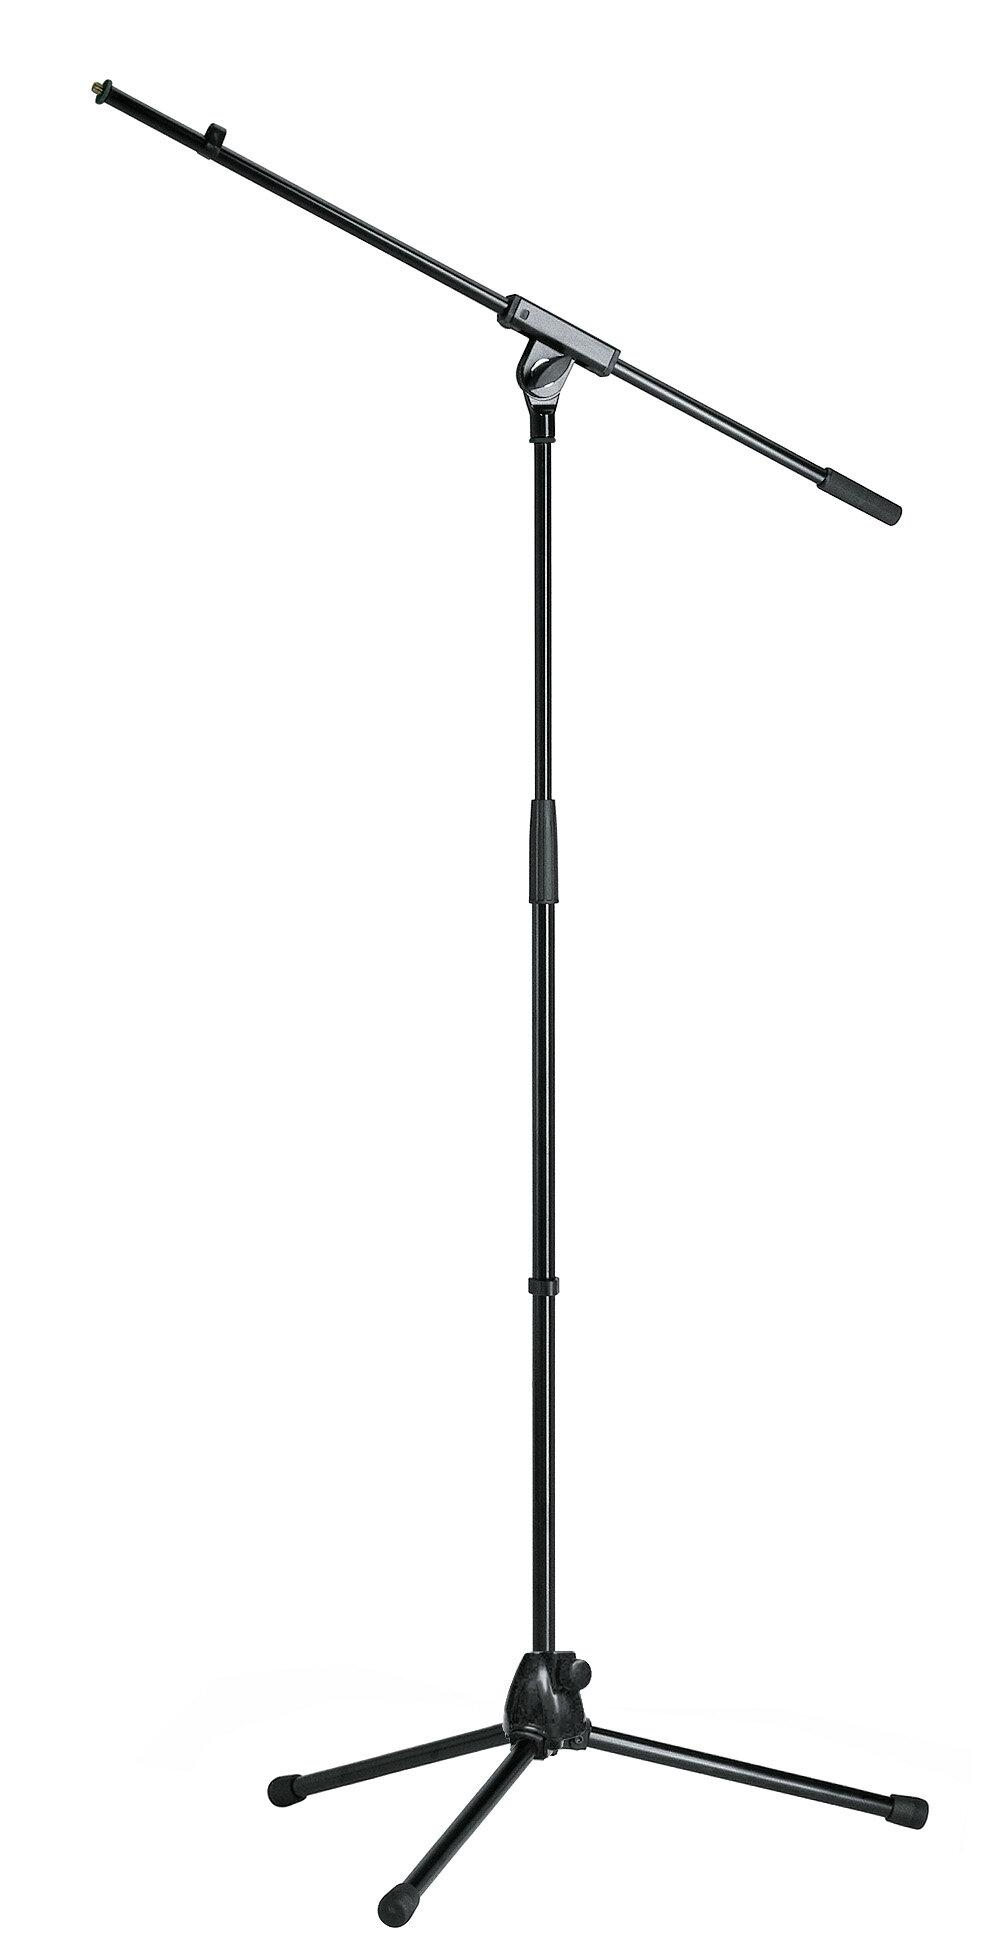 Konig & Meyer 21070 - Microphone stand